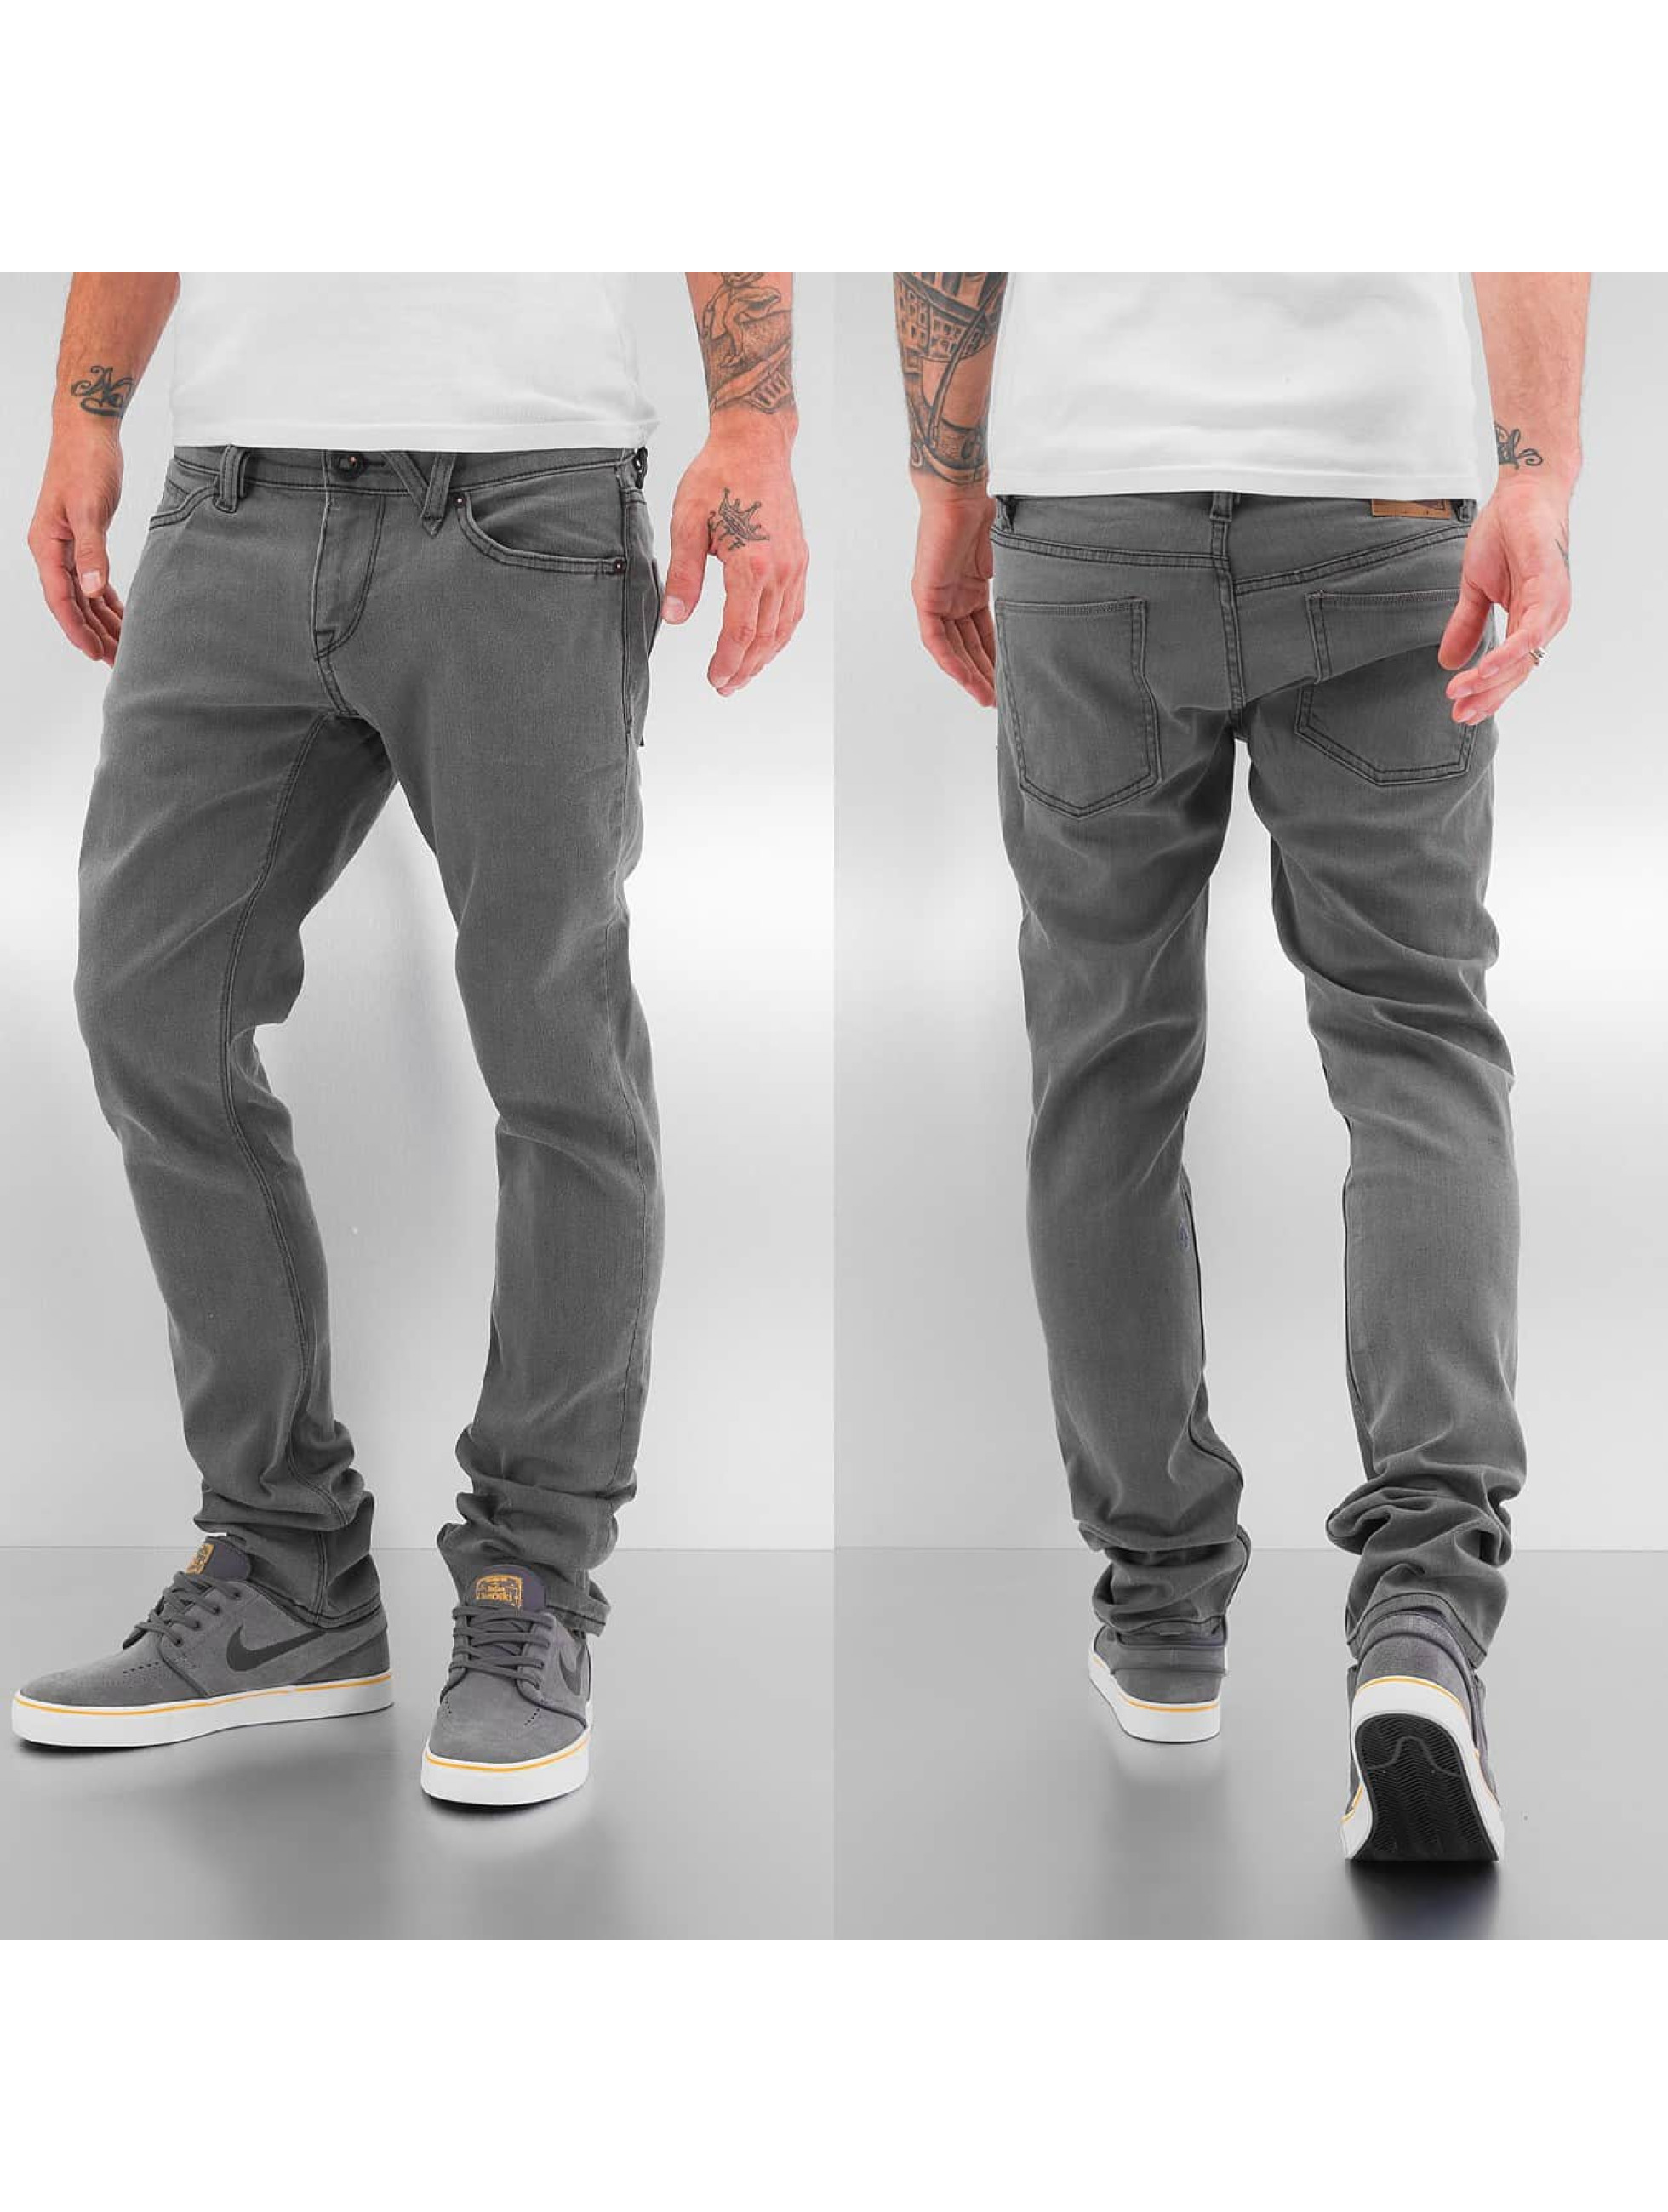 Volcom Skinny jeans 2x4 Denim grijs